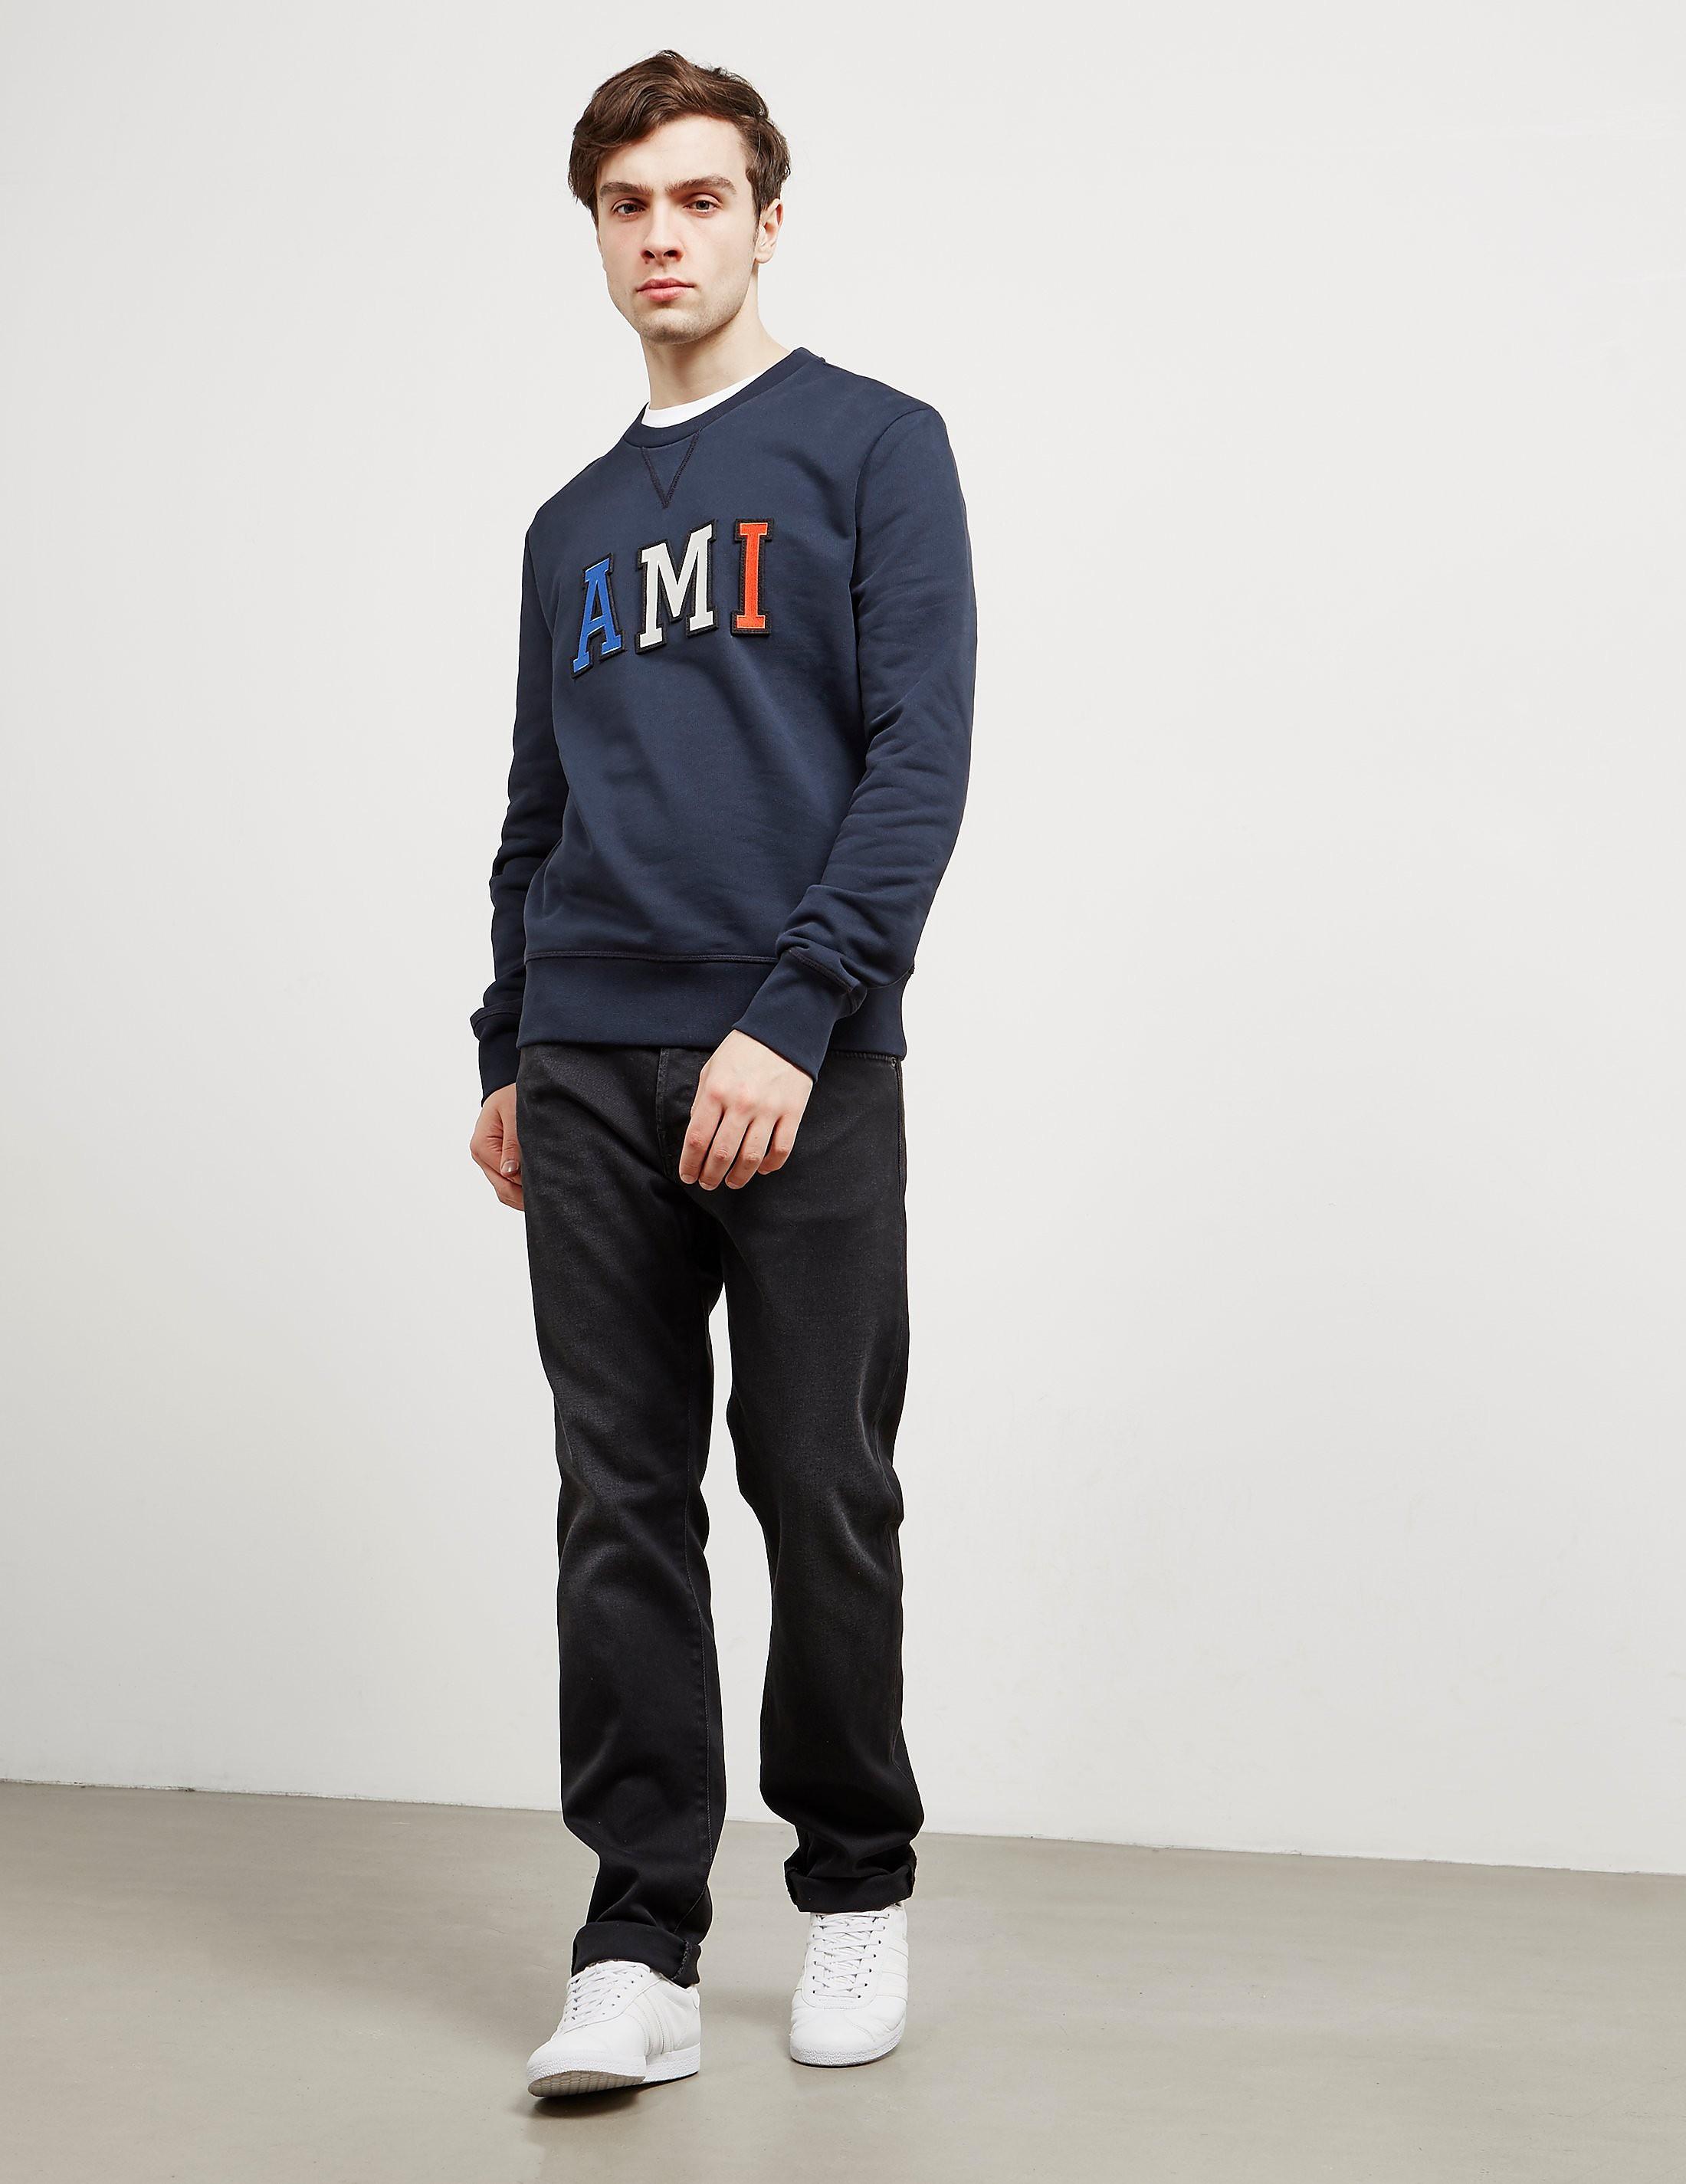 AMI Paris Patch Sweatshirt